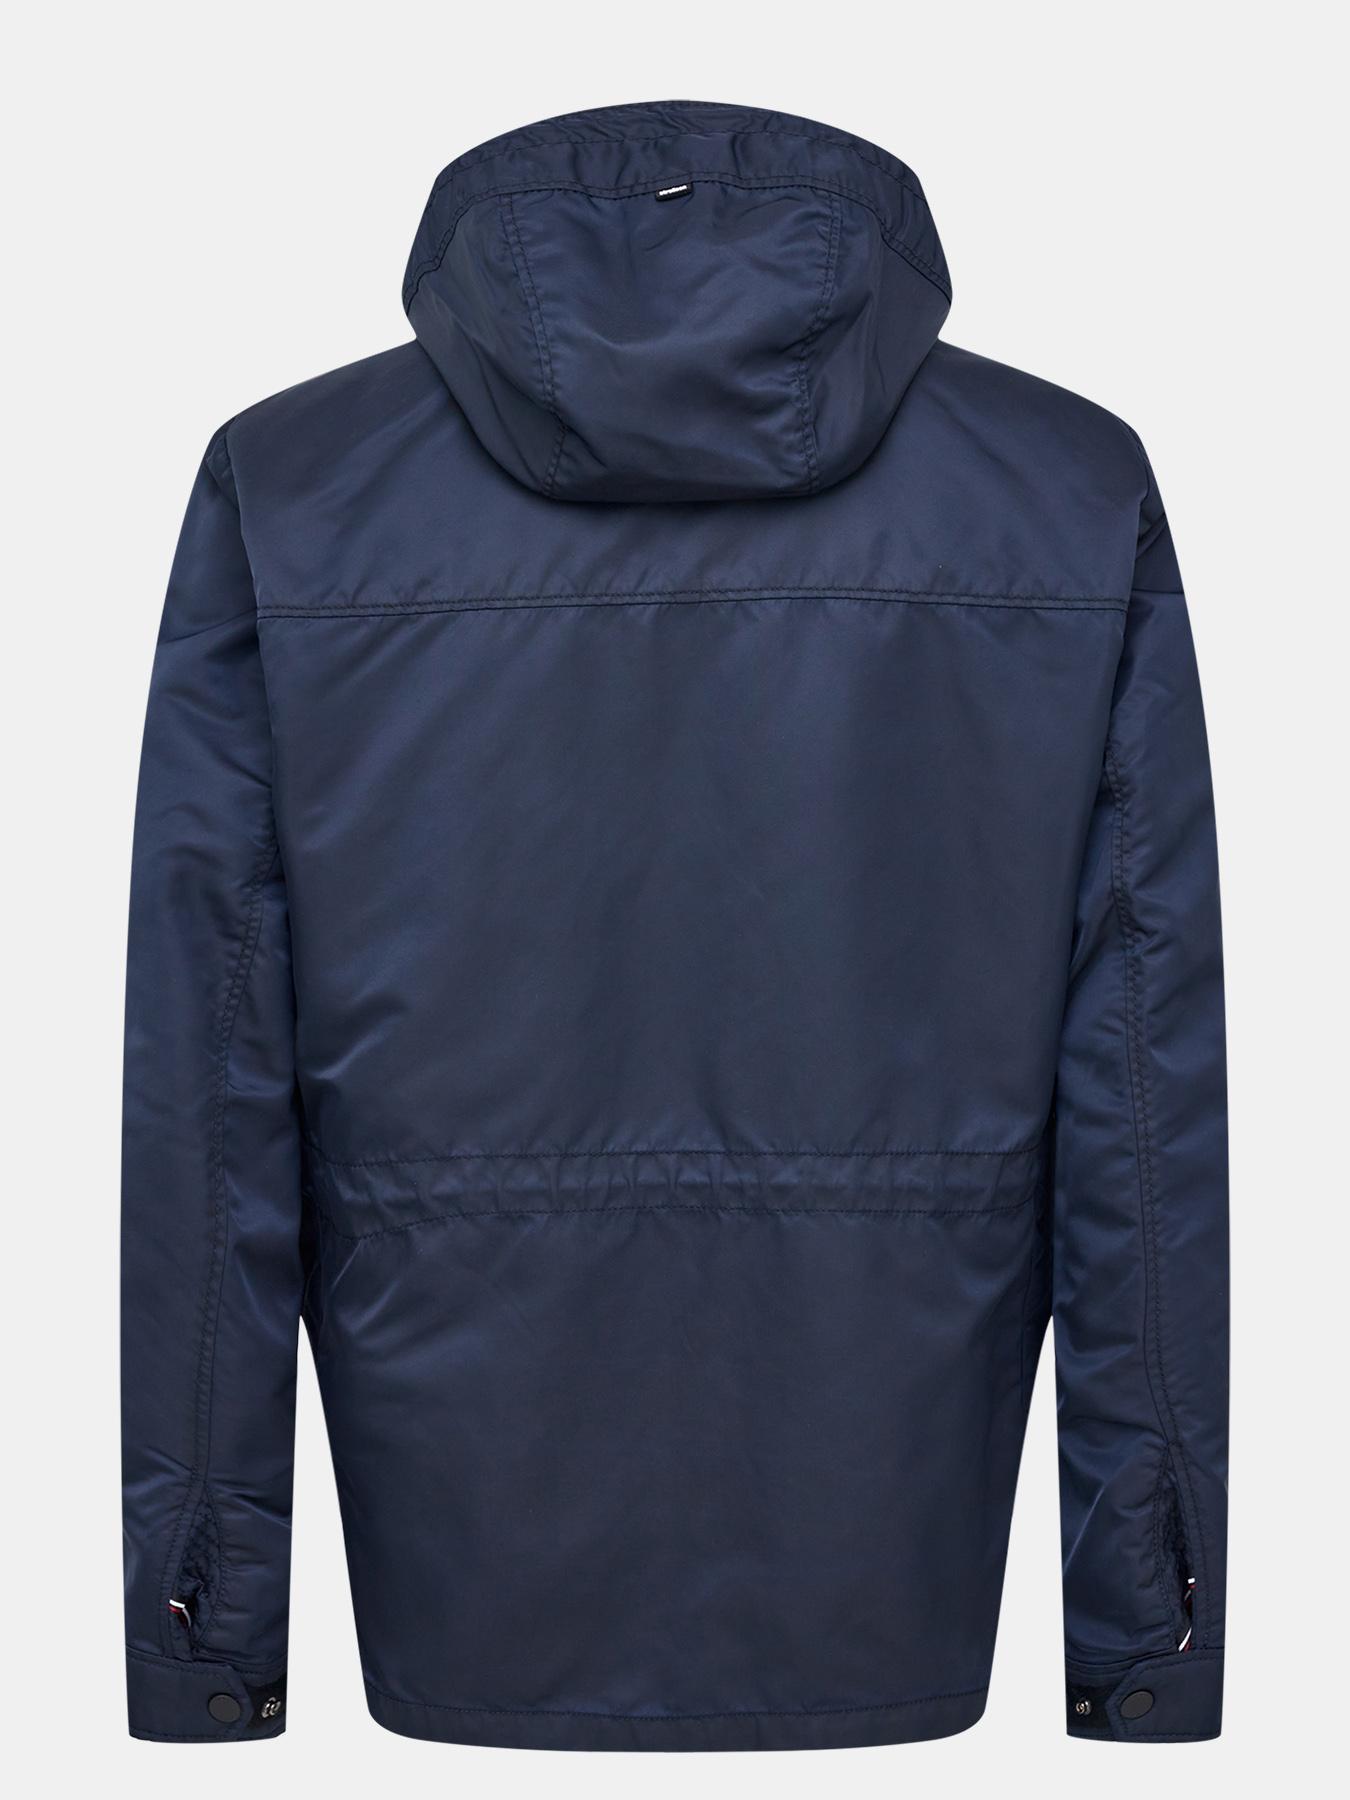 Куртка Strellson Куртка 2 в1 куртка кожаная strellson strellson st004emghji3